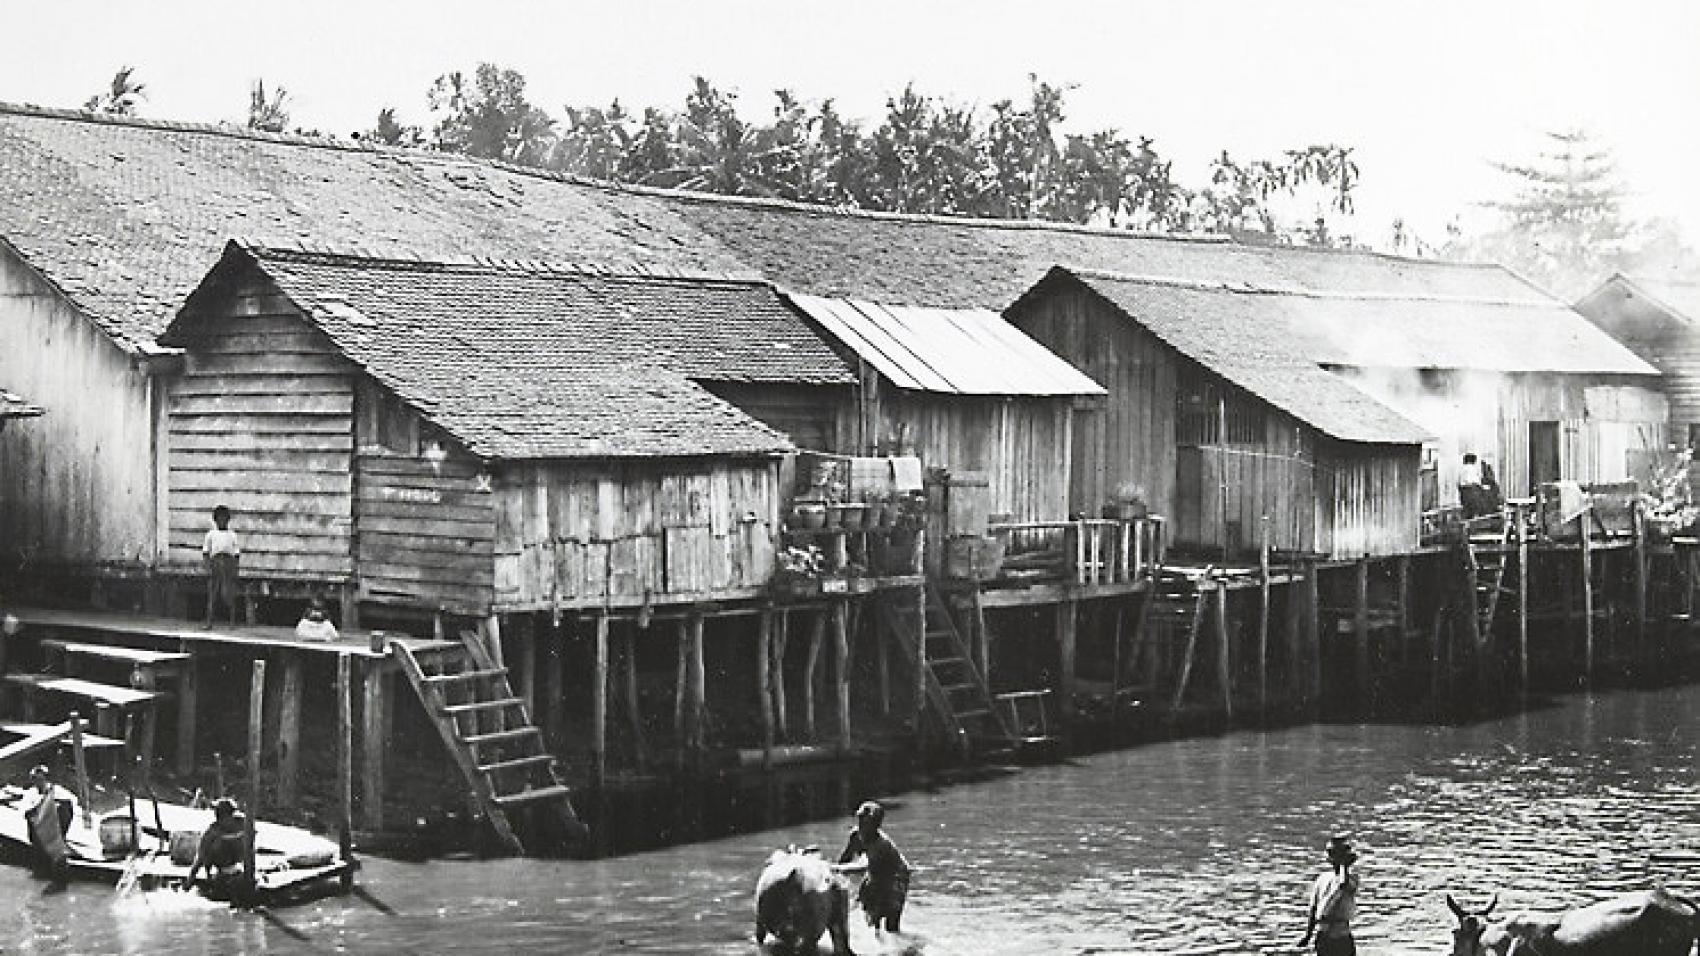 059-Siem-Reap-river-1919-26